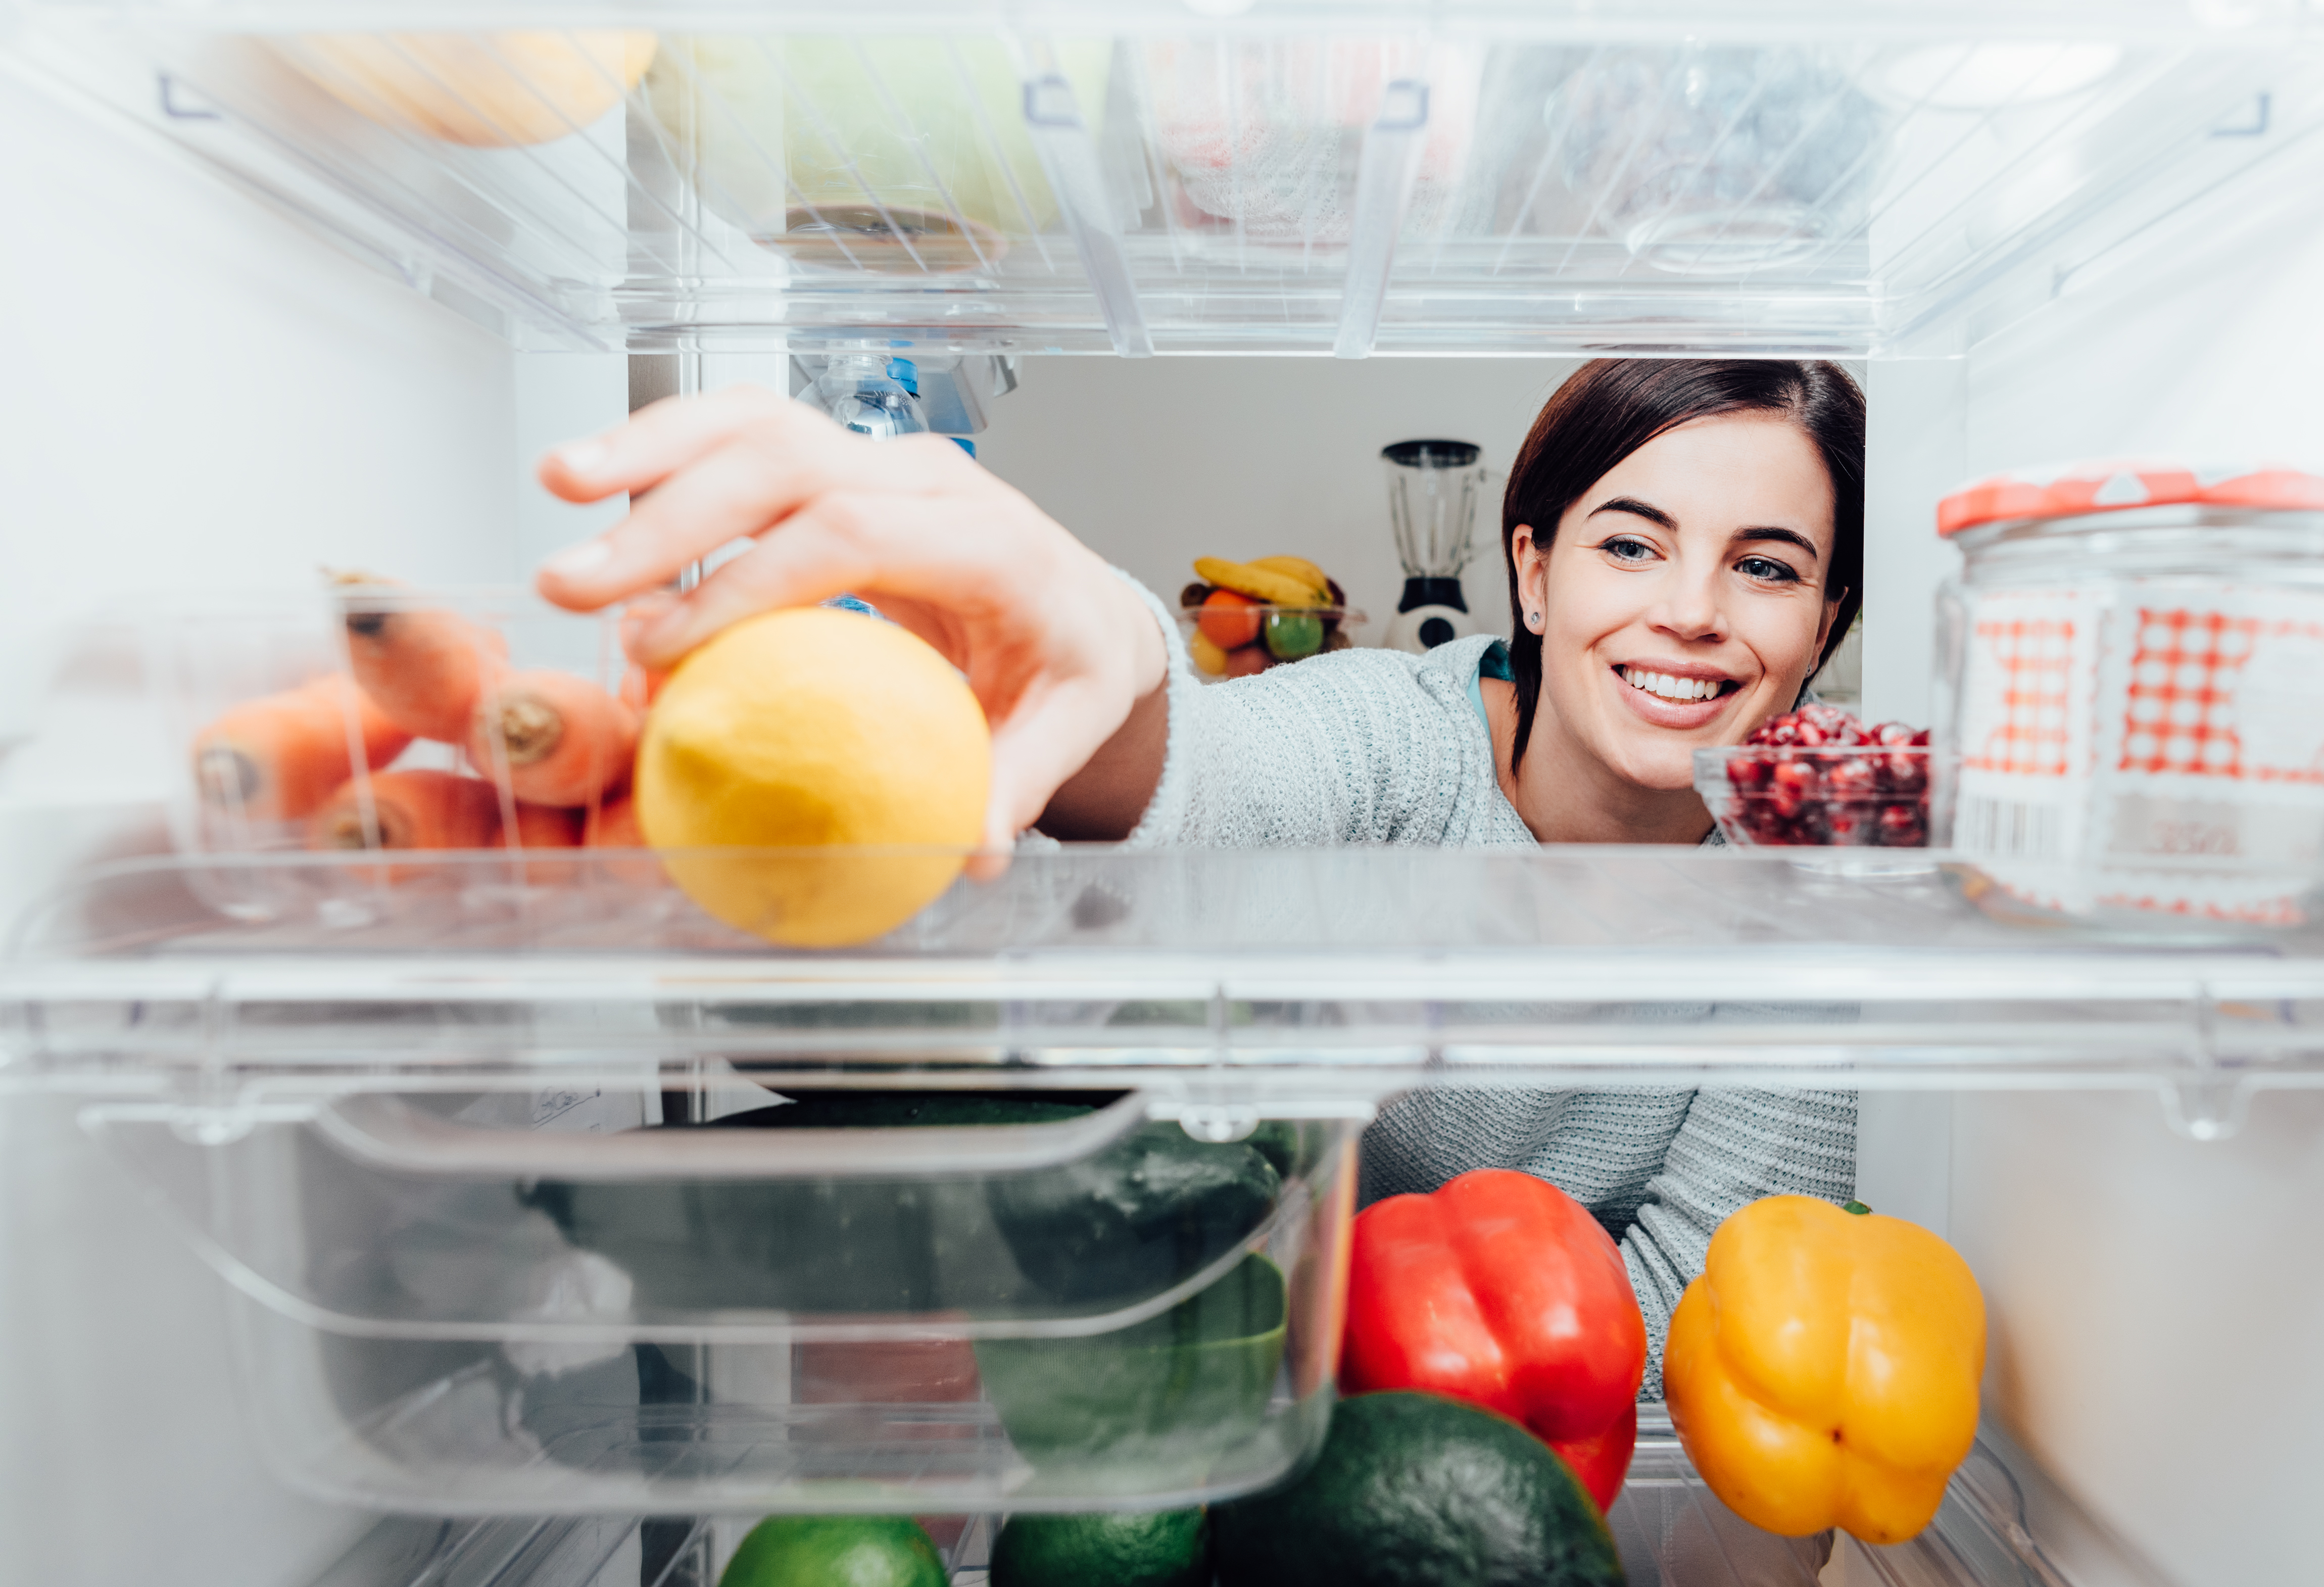 Woman taking a lemon out of the fridge